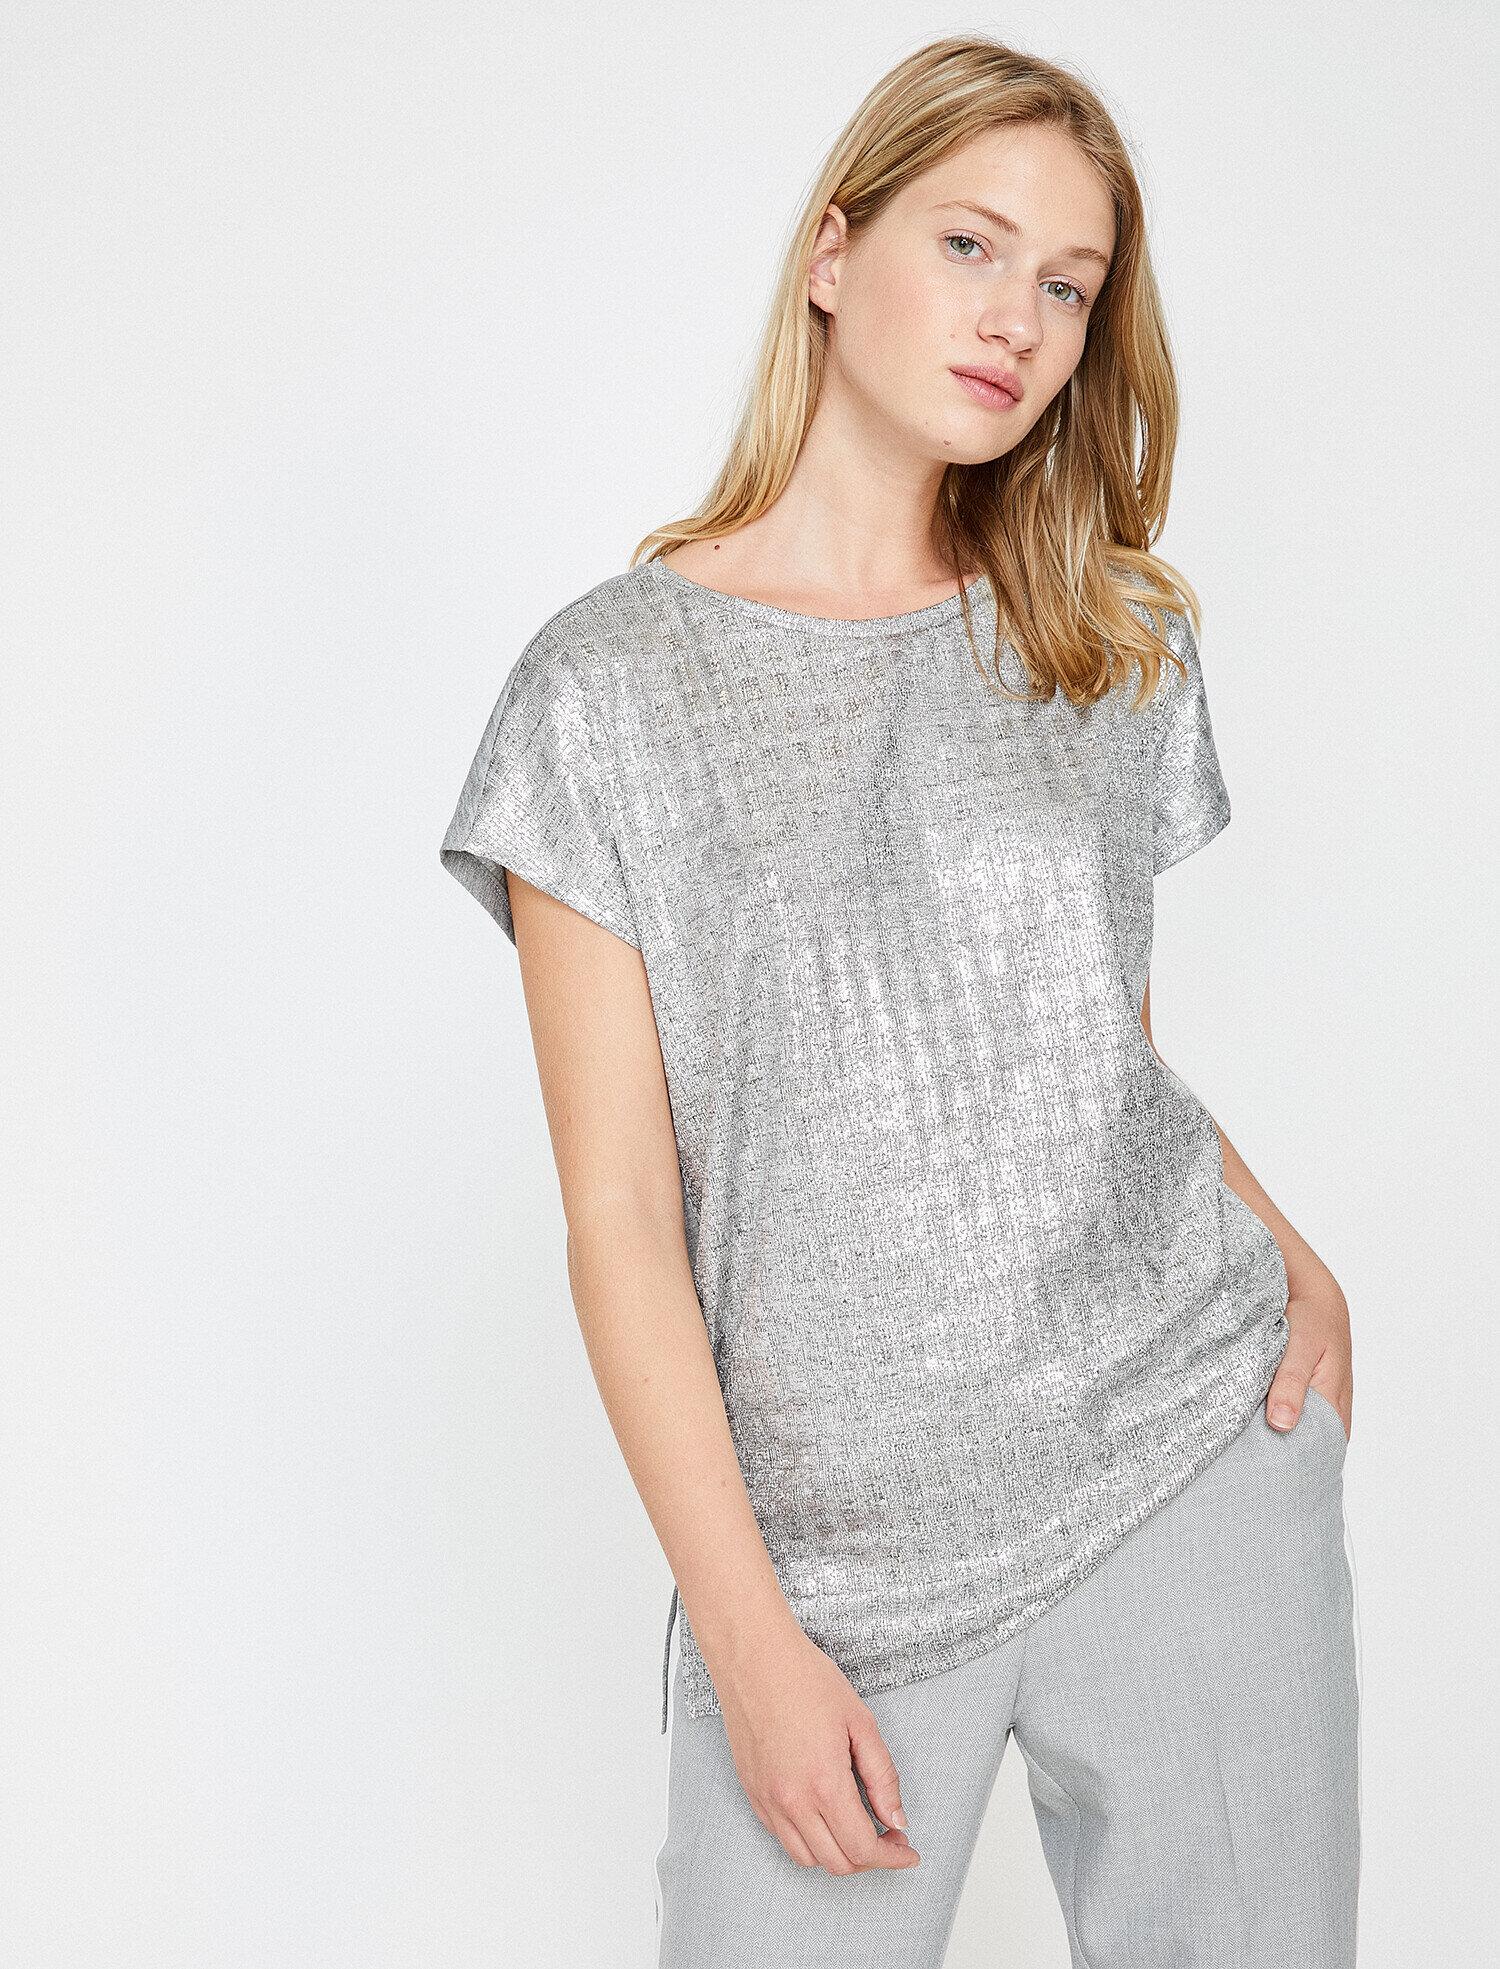 Gri Bayan Parlak T Shirt 9kak13024ek029 Koton